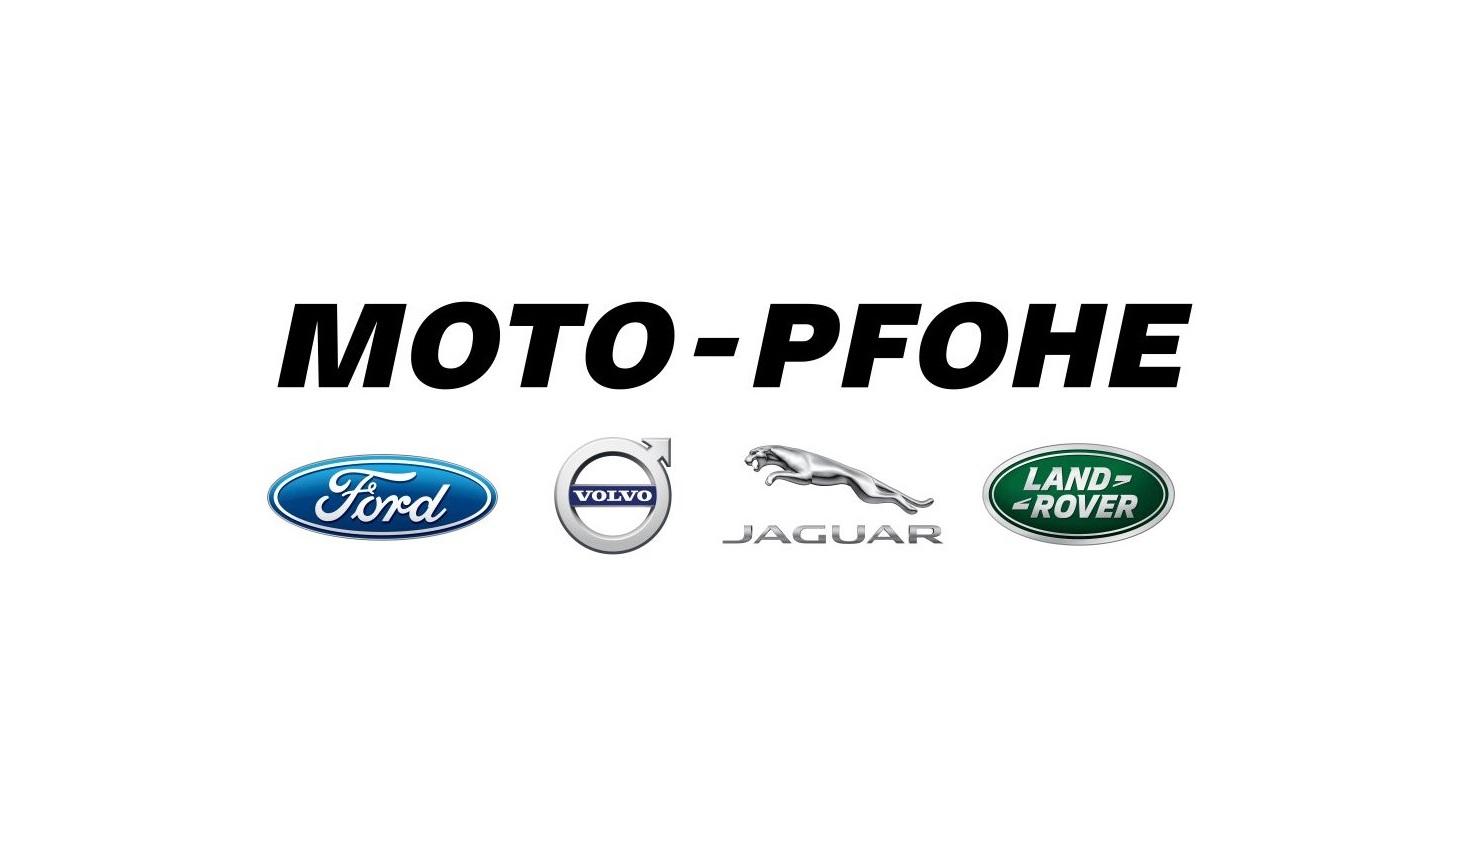 Moto Phohe